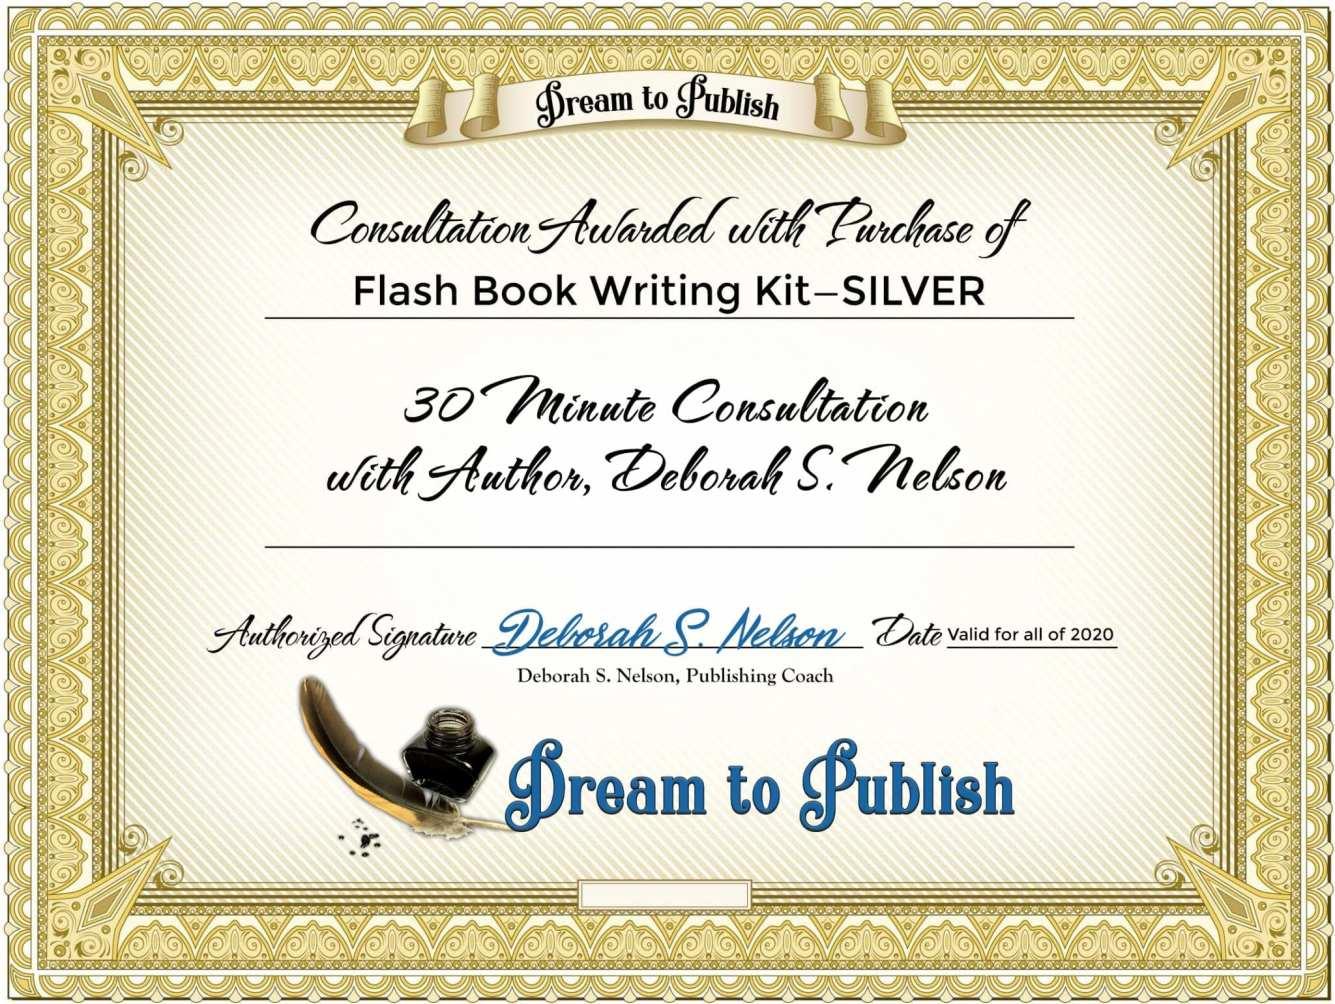 Flash Book Writing Kit—SILVER Certificate